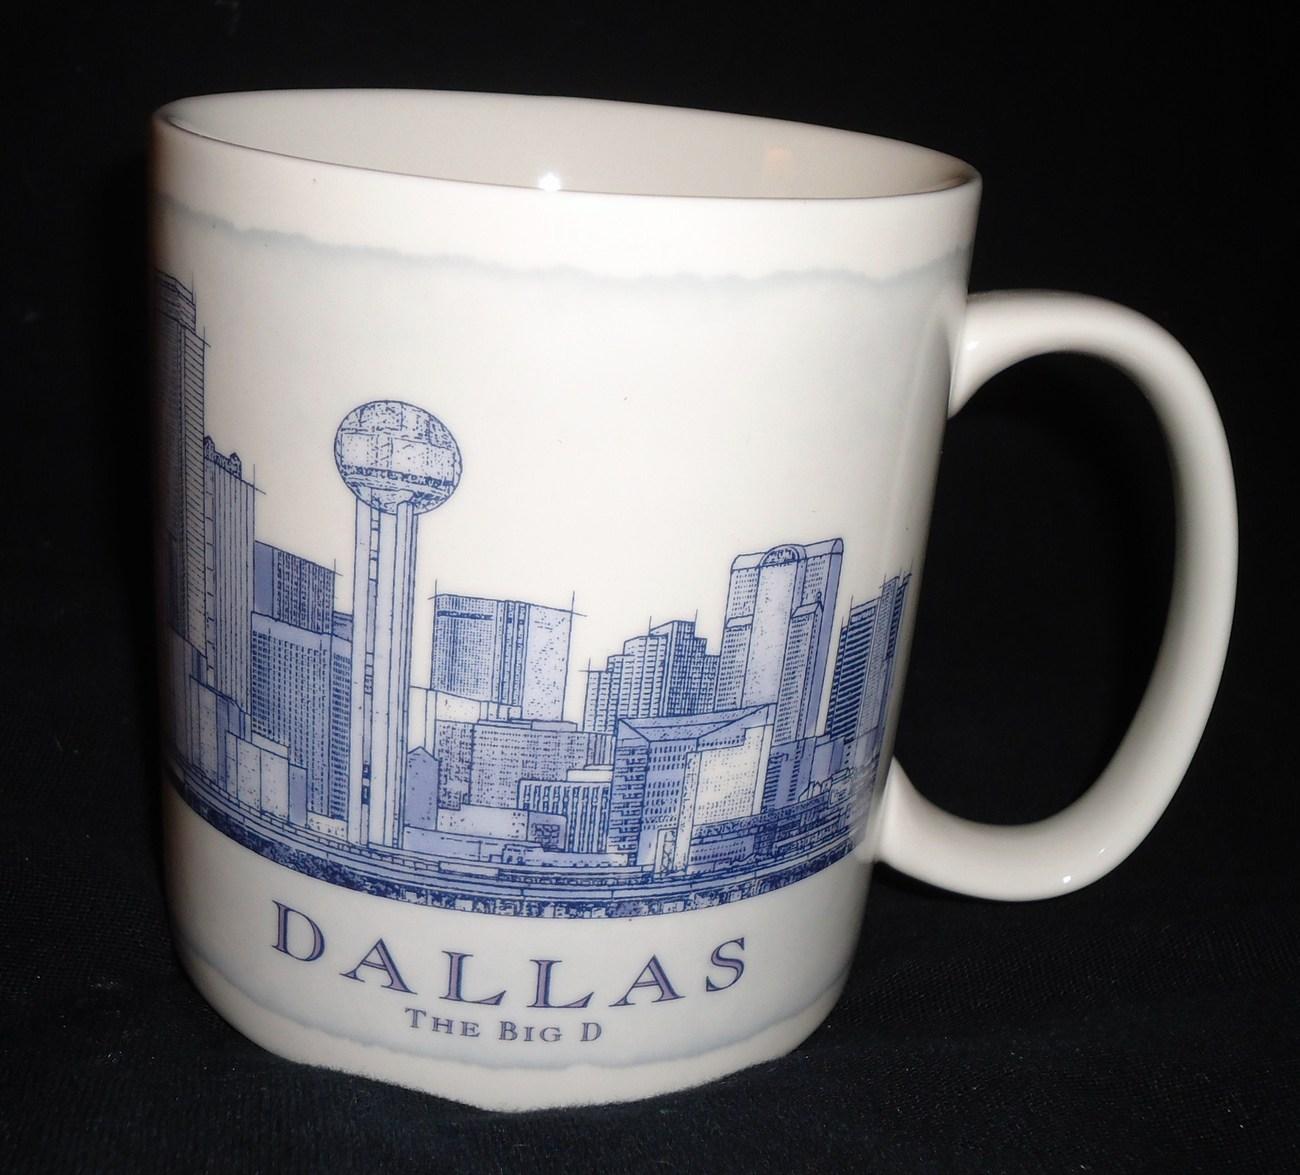 Starbucks Architect City Coffee Cup Tea Mug Dallas Texas The Big D 18 oz